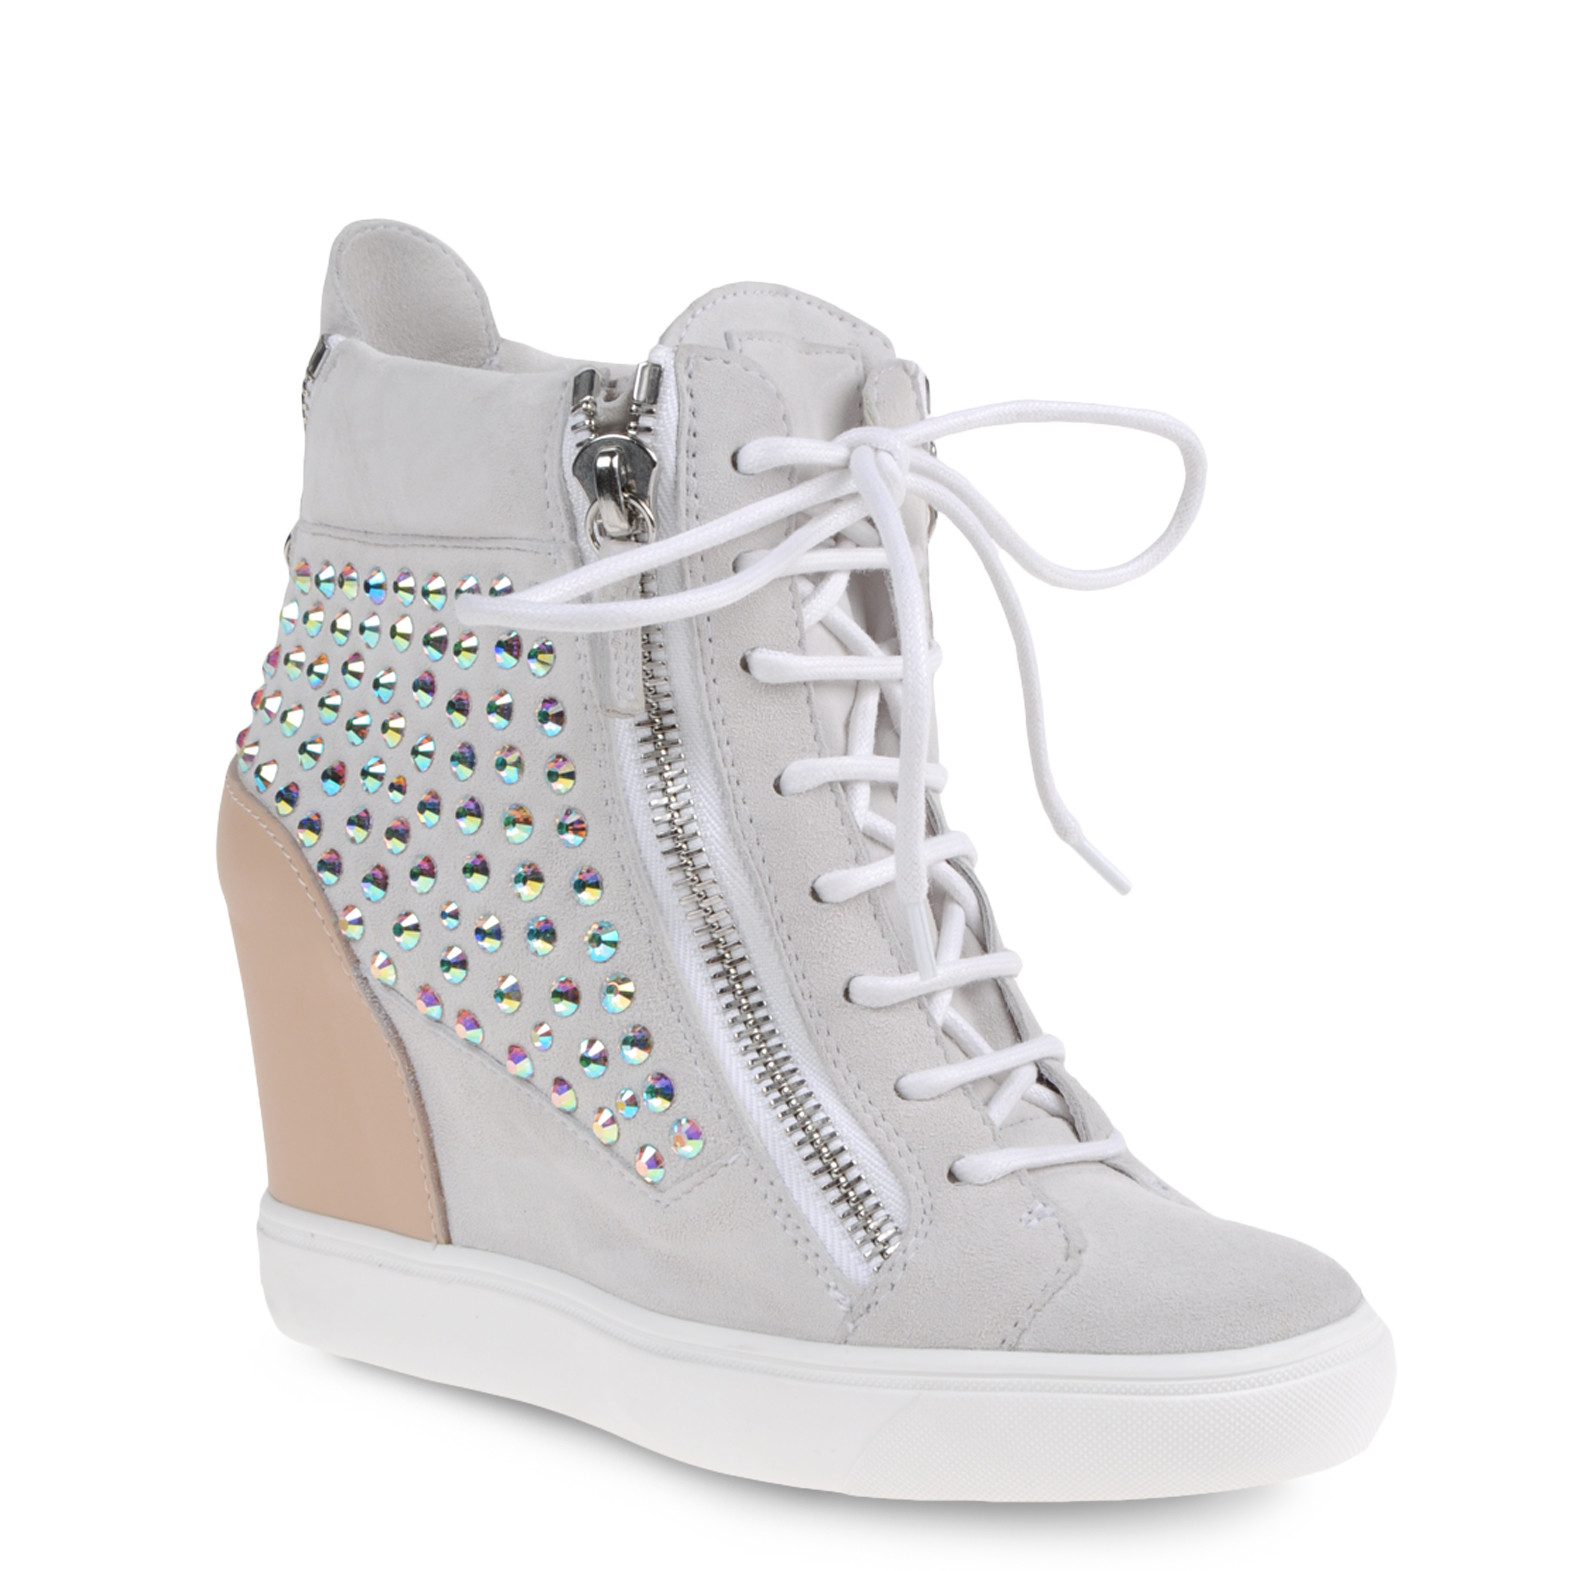 high top sneakers for women womens high top sneakers high sneakers for women topsneakers murgebo zbguzme